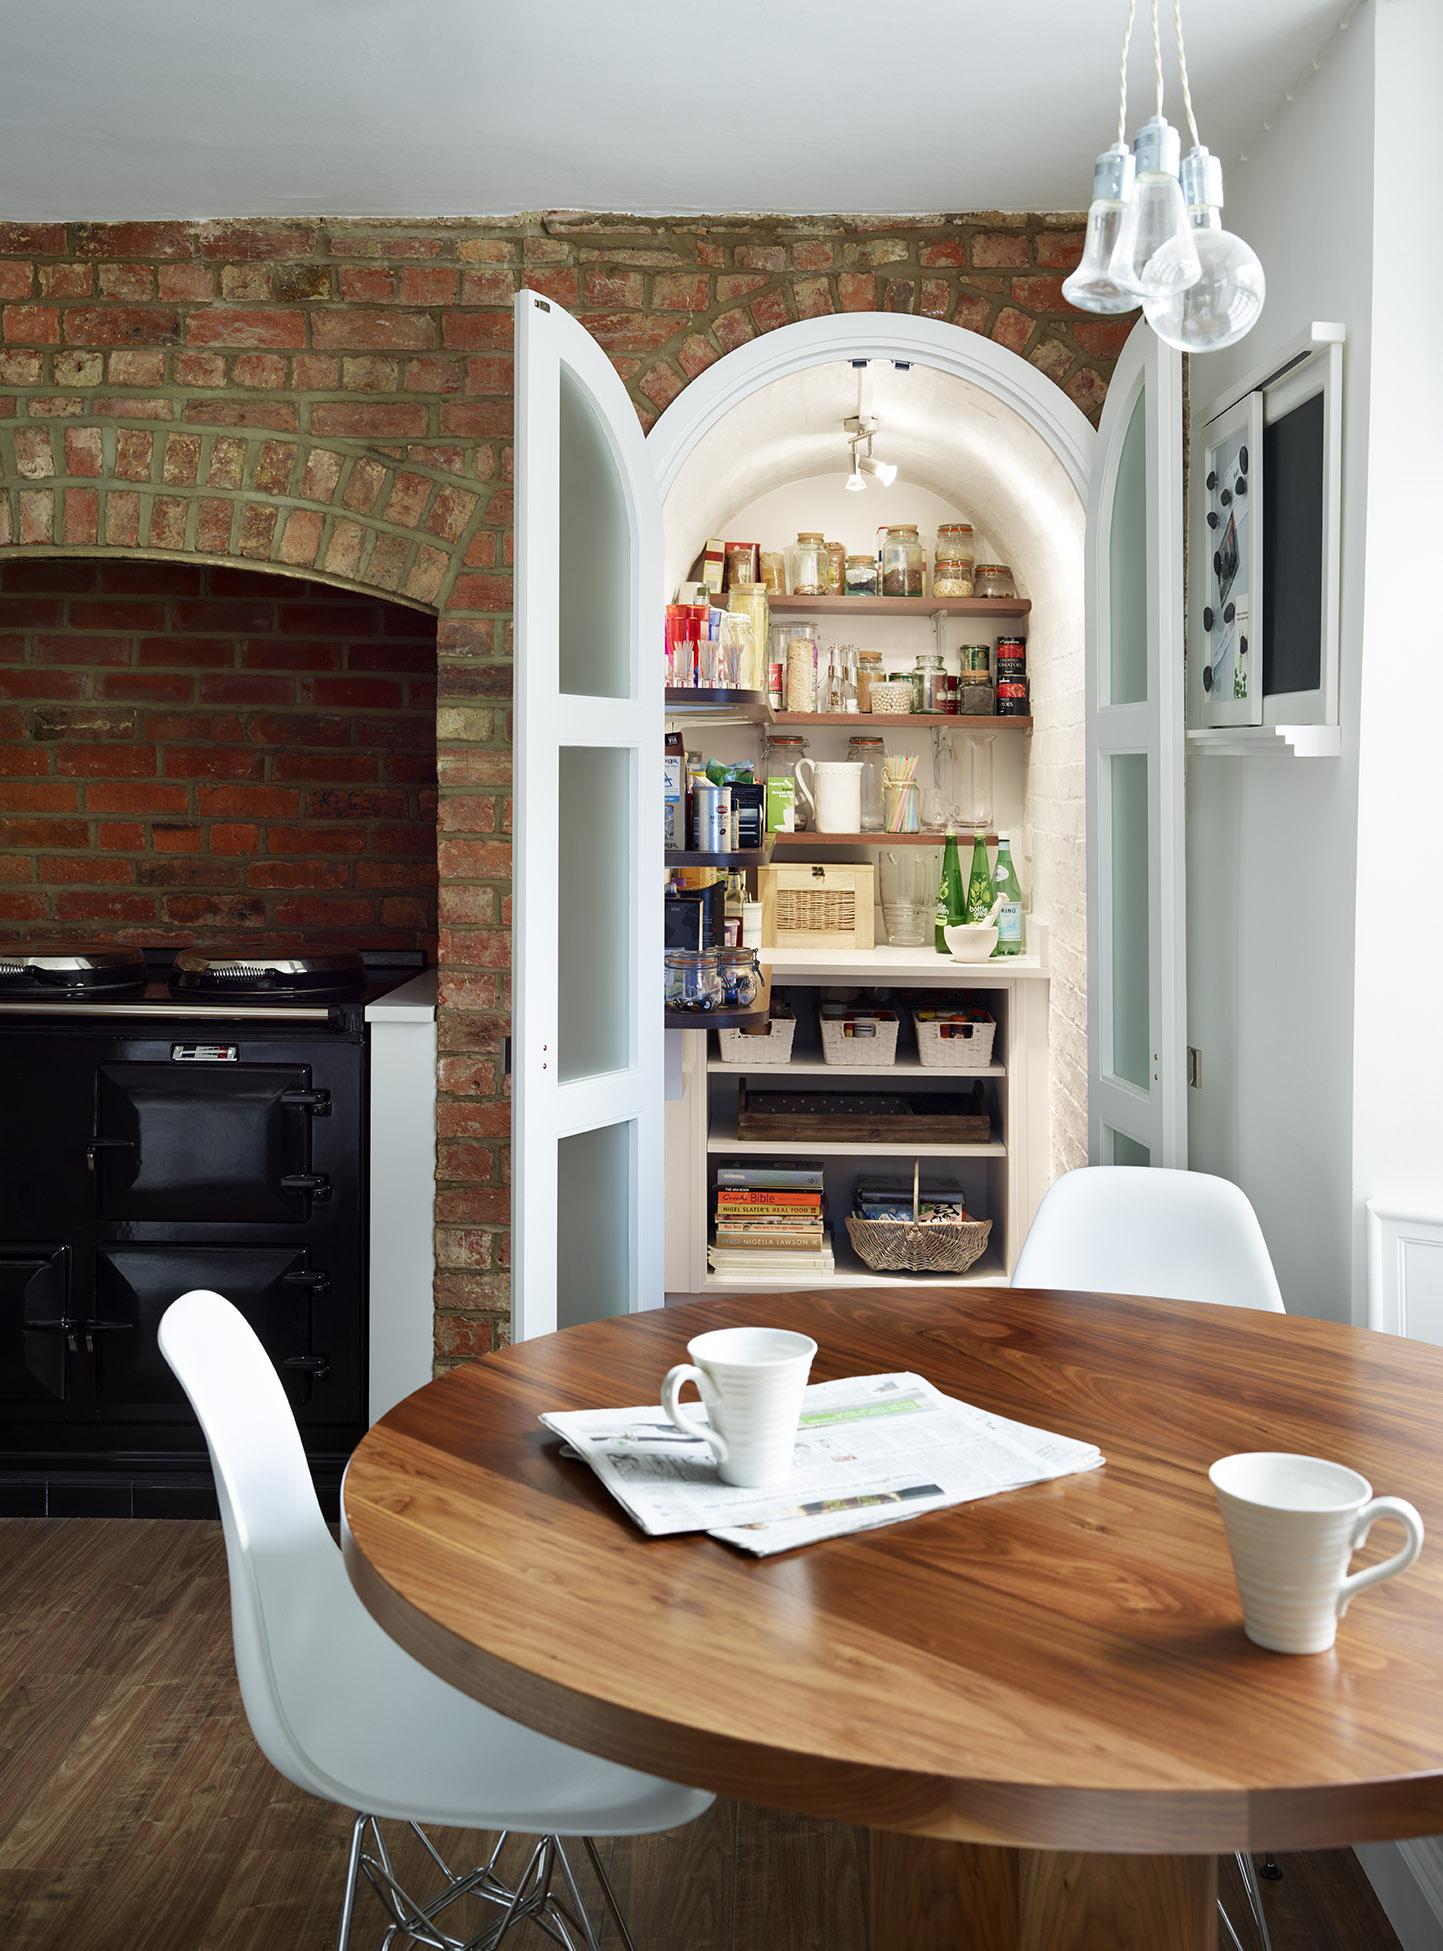 Stoke Goldington - Pantry with doors open revealing plenty of storage